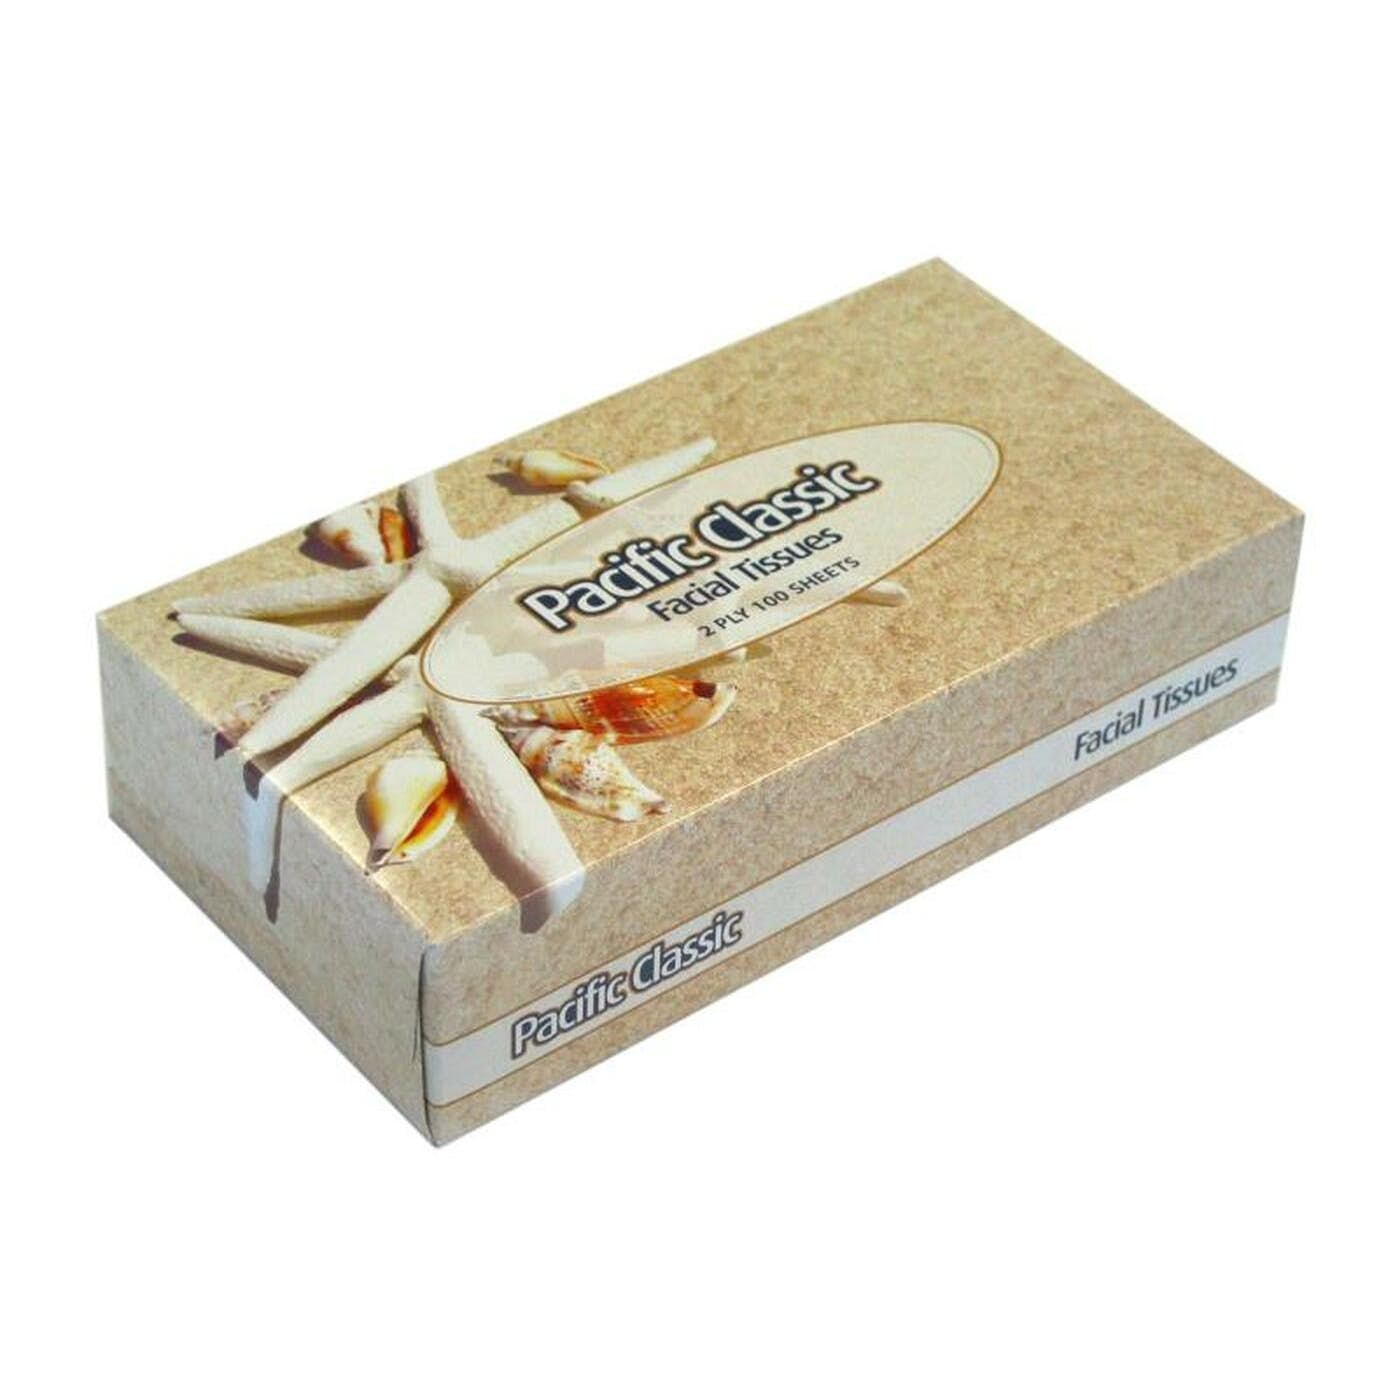 FACIAL TISSUES  BOX 100